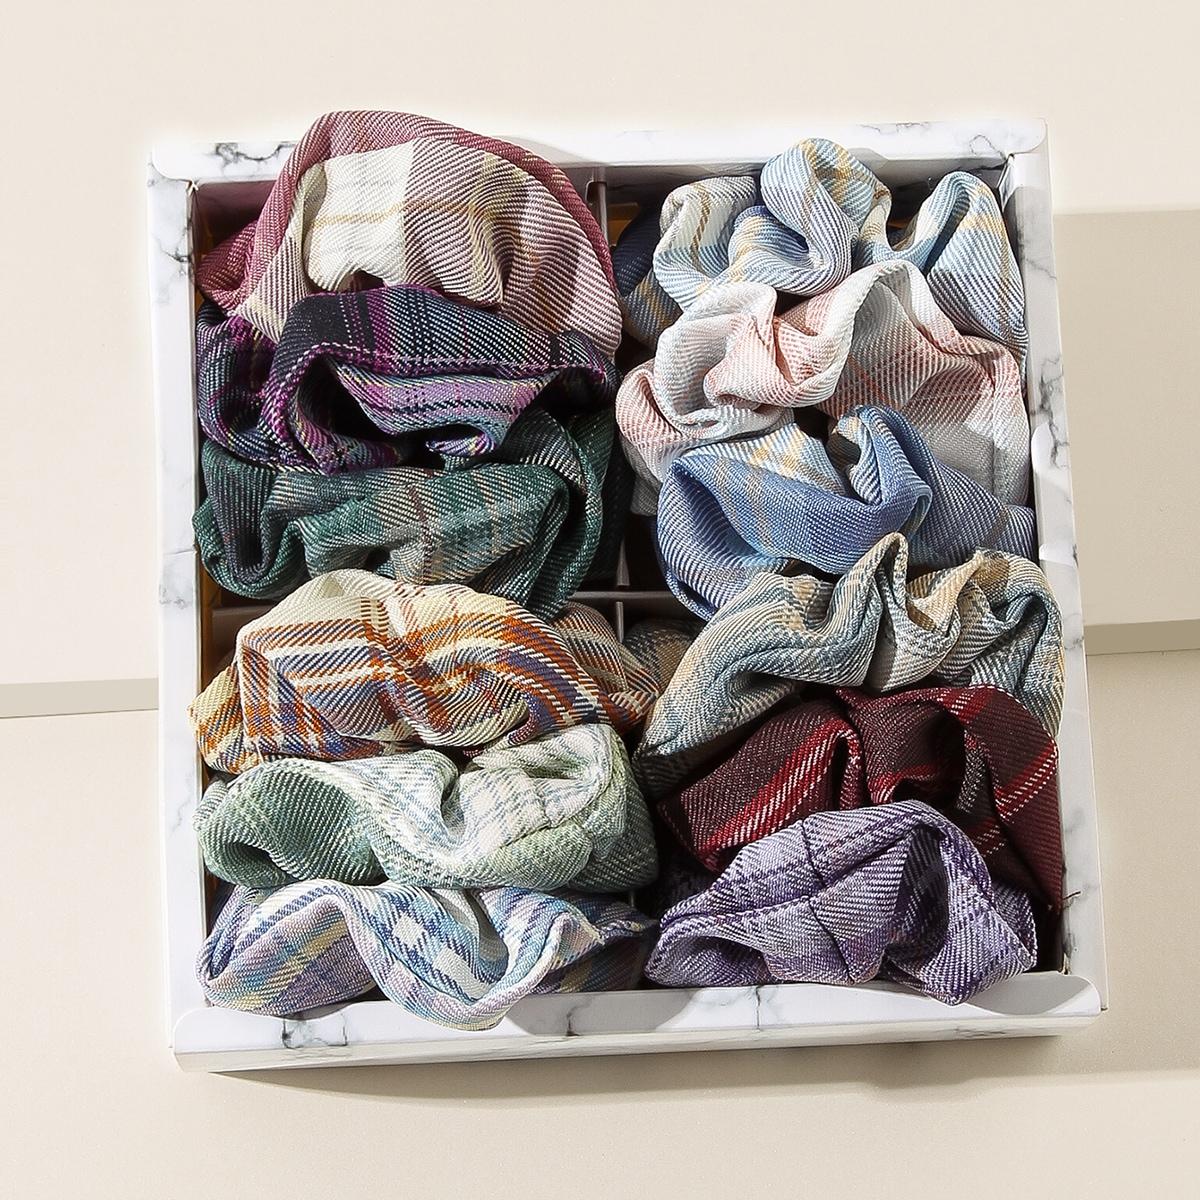 1Plaid Pattern Scrunchie, SHEIN  - buy with discount